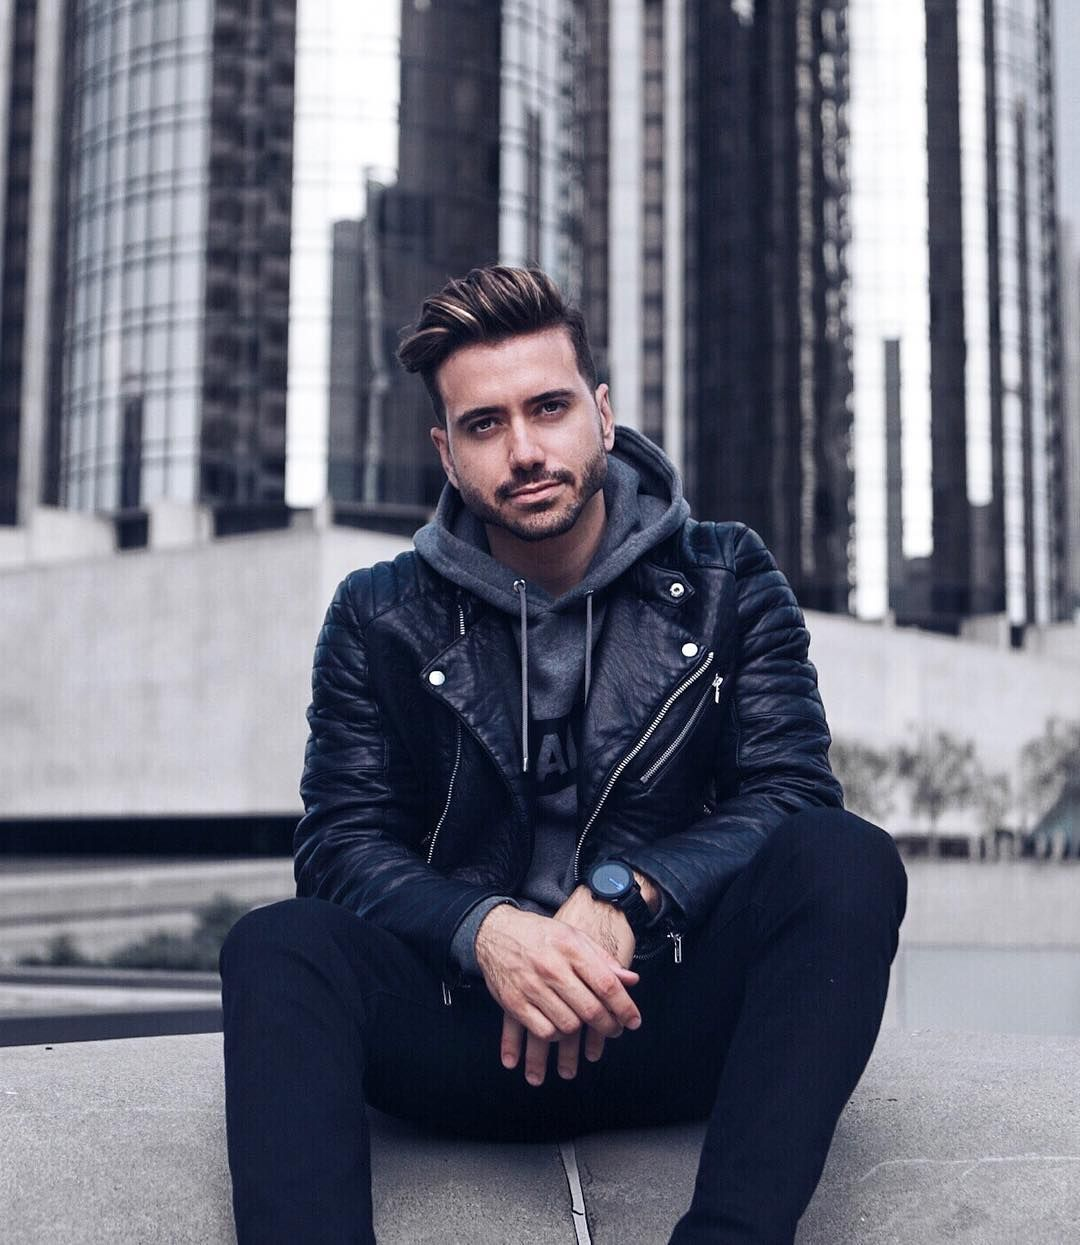 Https Www Instagram Com P Bzpfwuchnfm Hl Pt Br Leather Jacket Leather Jacket Men Mens Cold Weather Fashion [ 1245 x 1080 Pixel ]